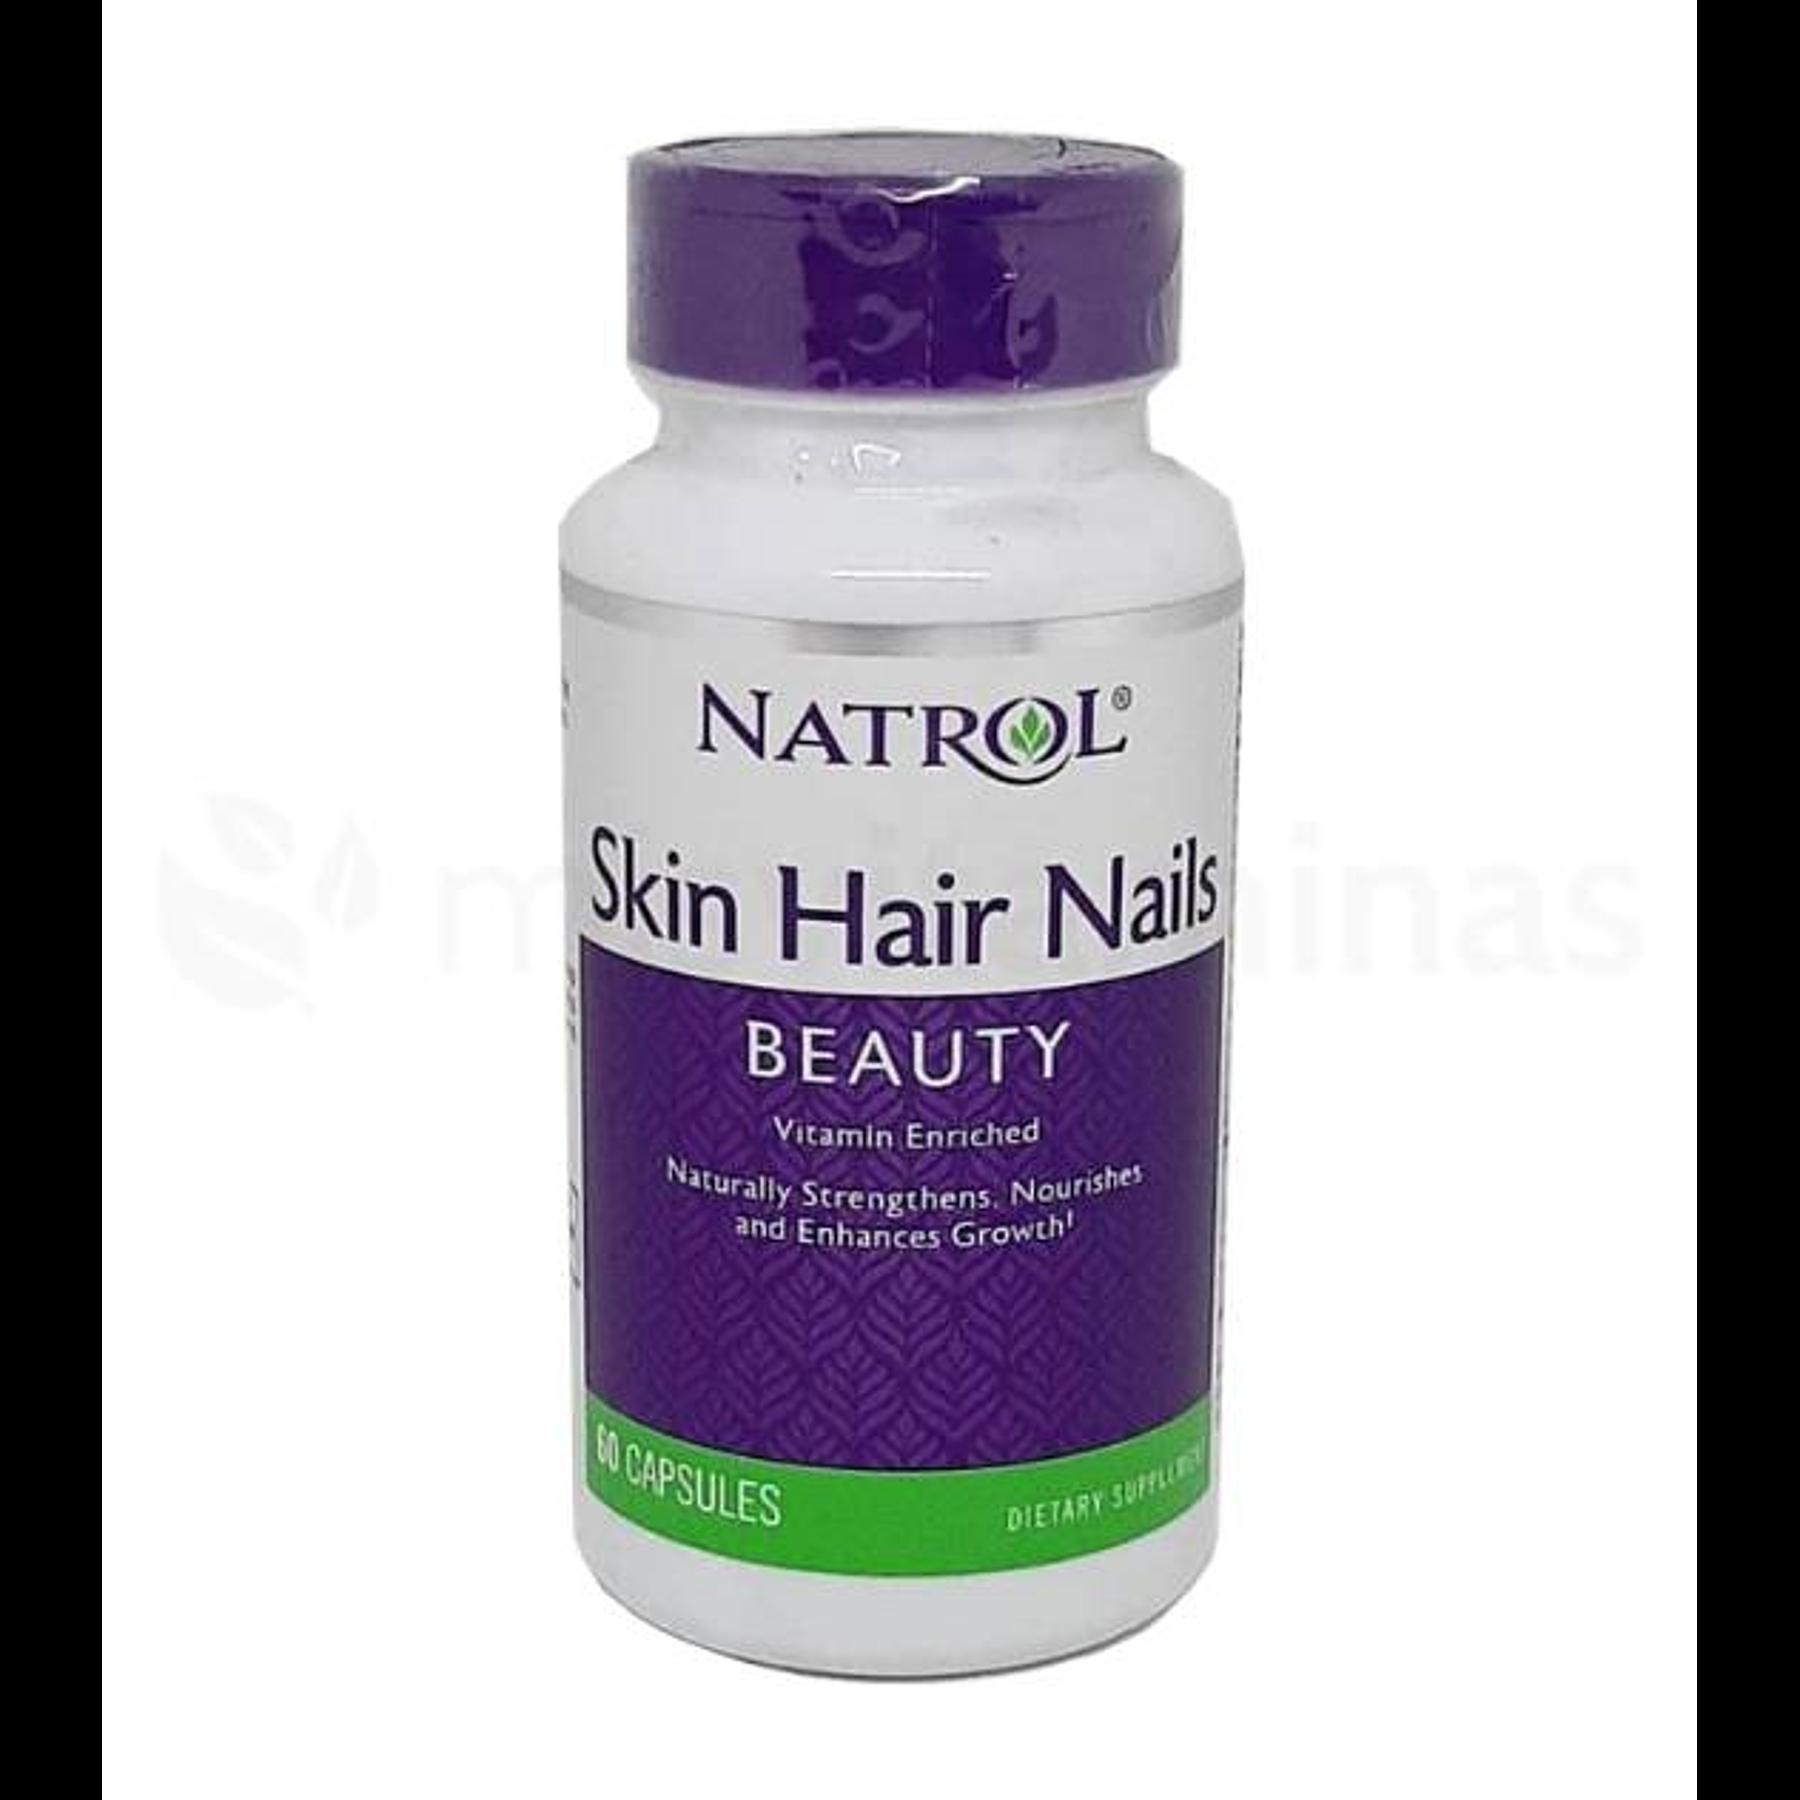 Skin Hair Nails Beauty Natrol